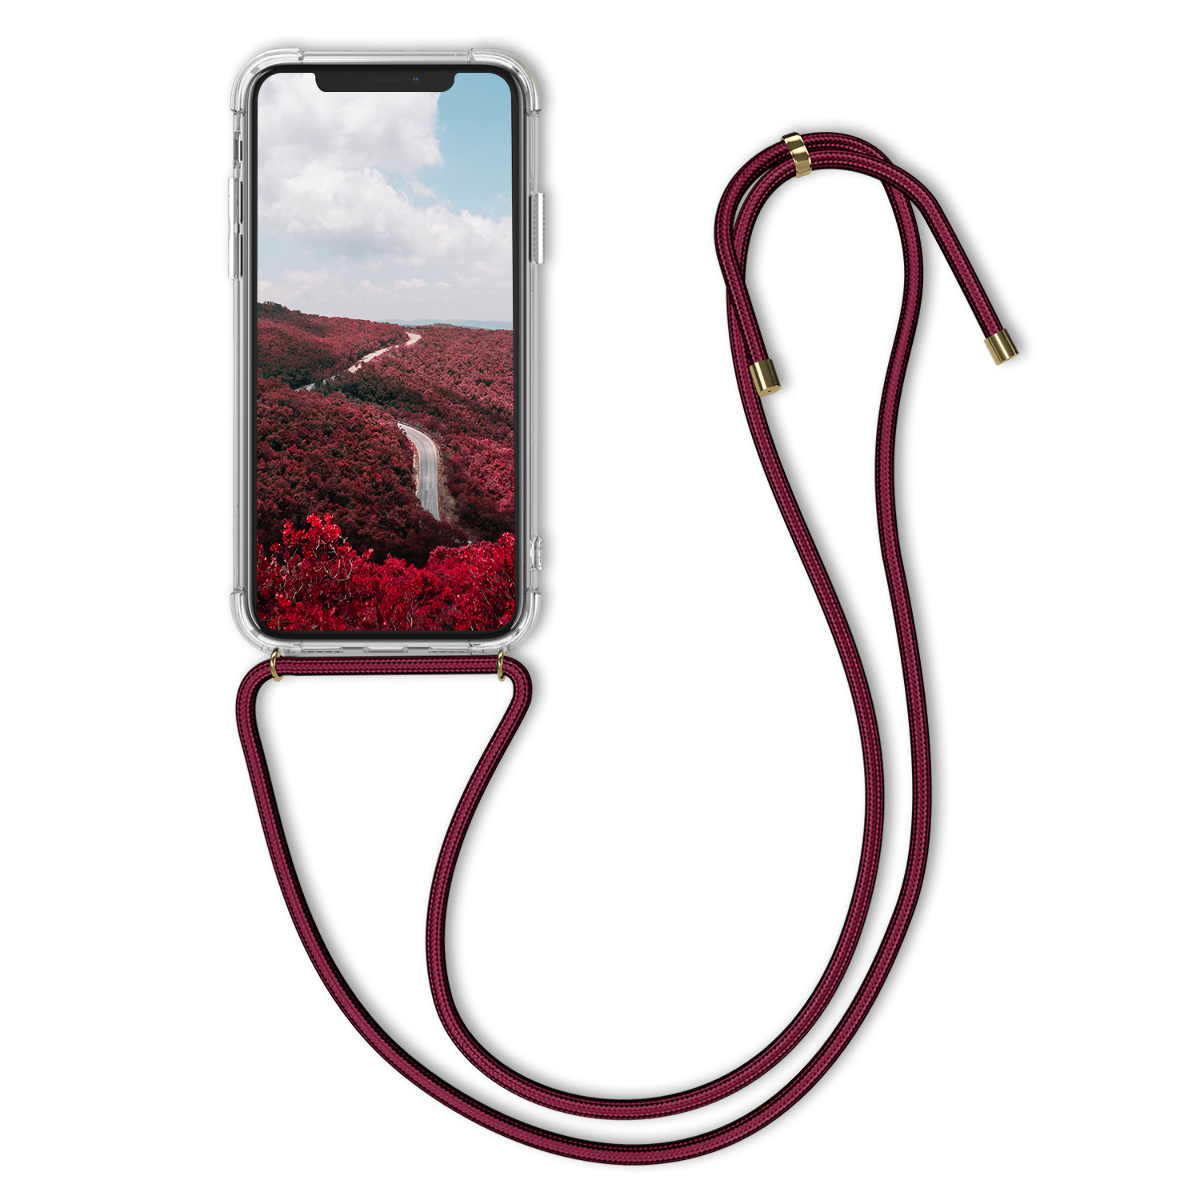 Kvalitní silikonové TPU pouzdro pro Apple iPhone X - Transparent | Dark Red